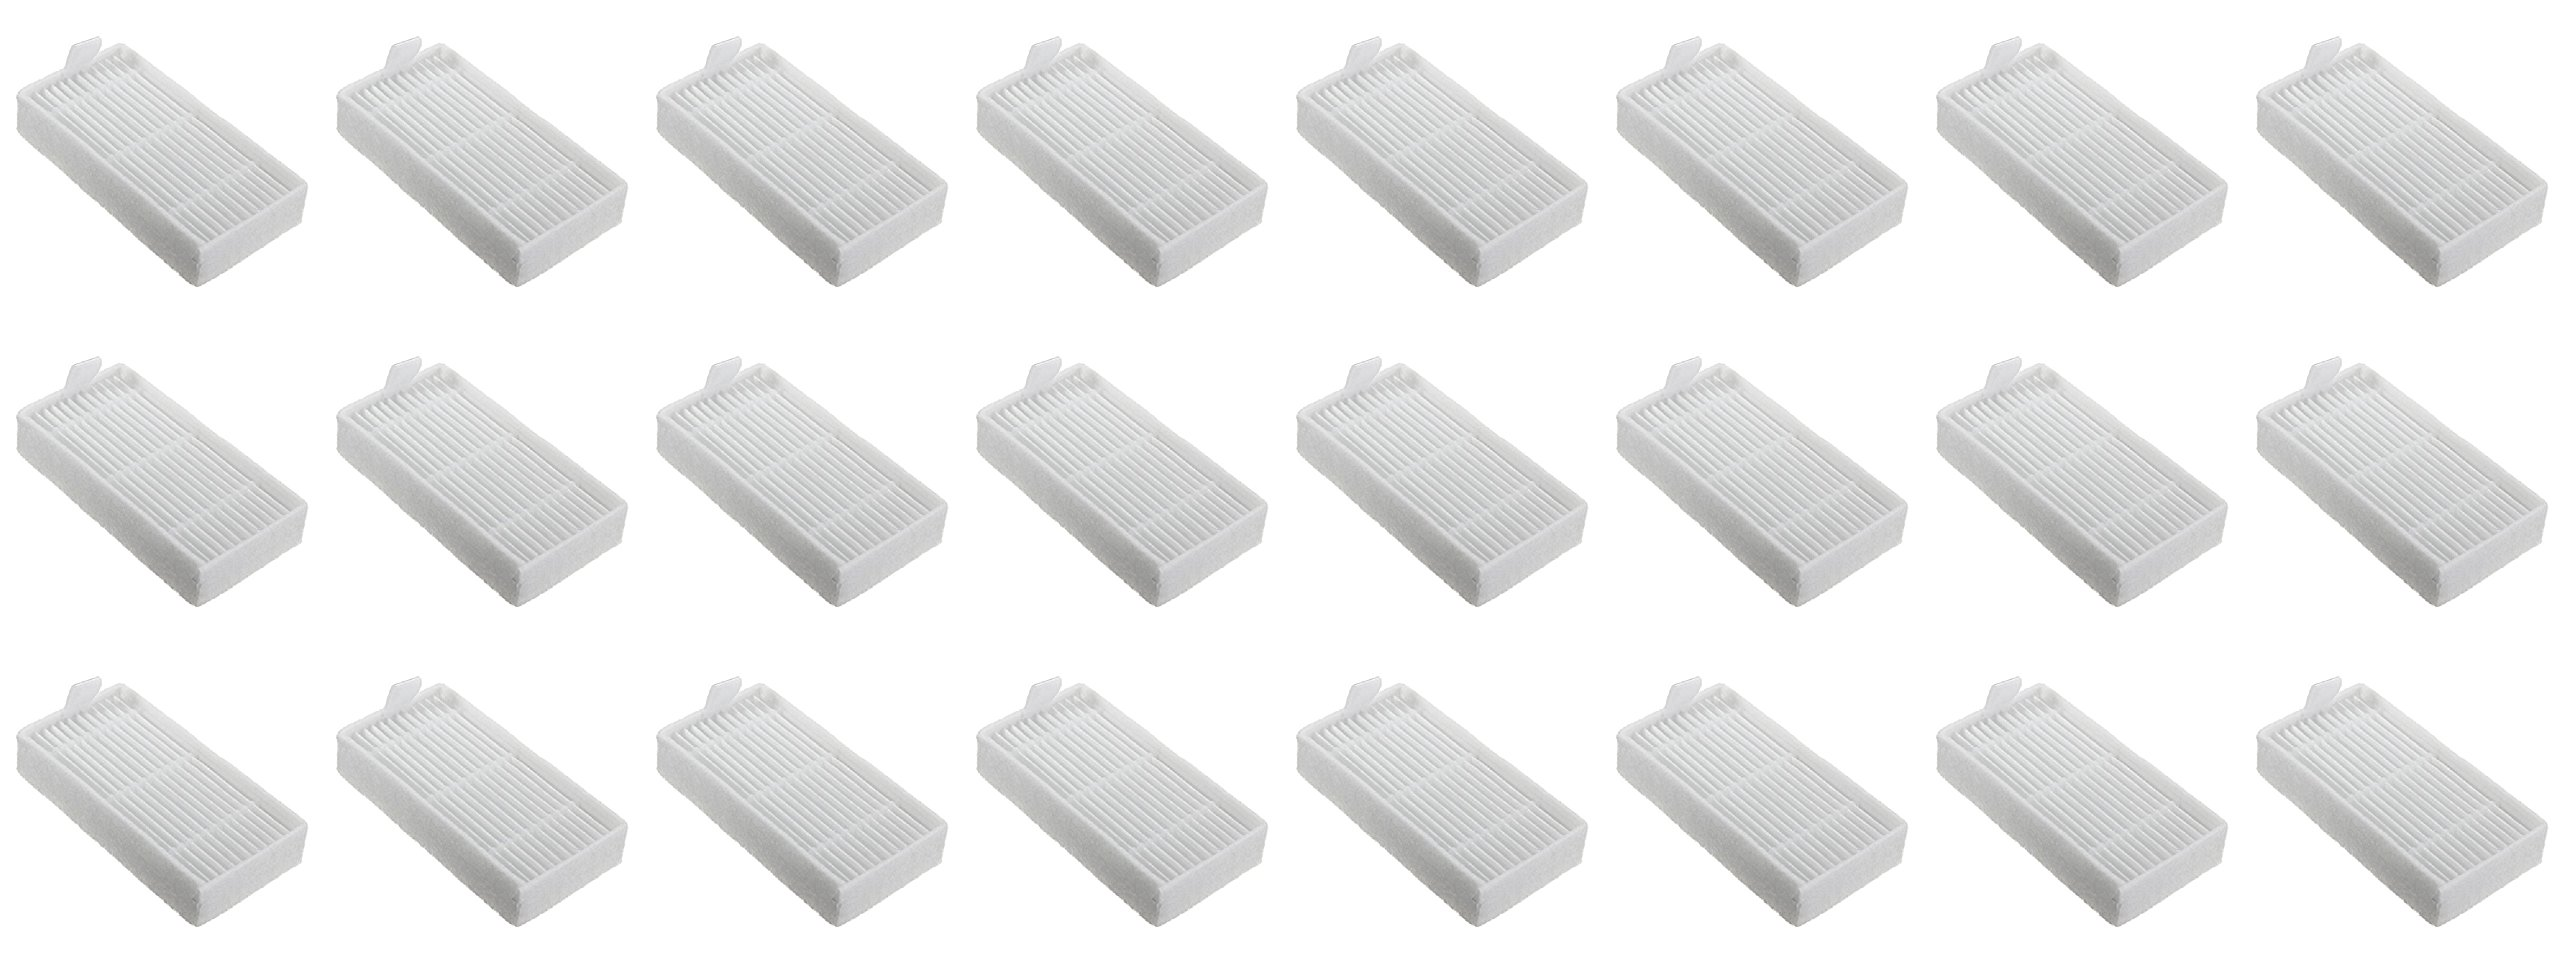 Nispira HEPA Replacement Filter Compatible Ilife Model V3s V3s pro, V5, and V5s V5s Pro Robotic Vacuum Cleaner, 24 Packs by Nispira